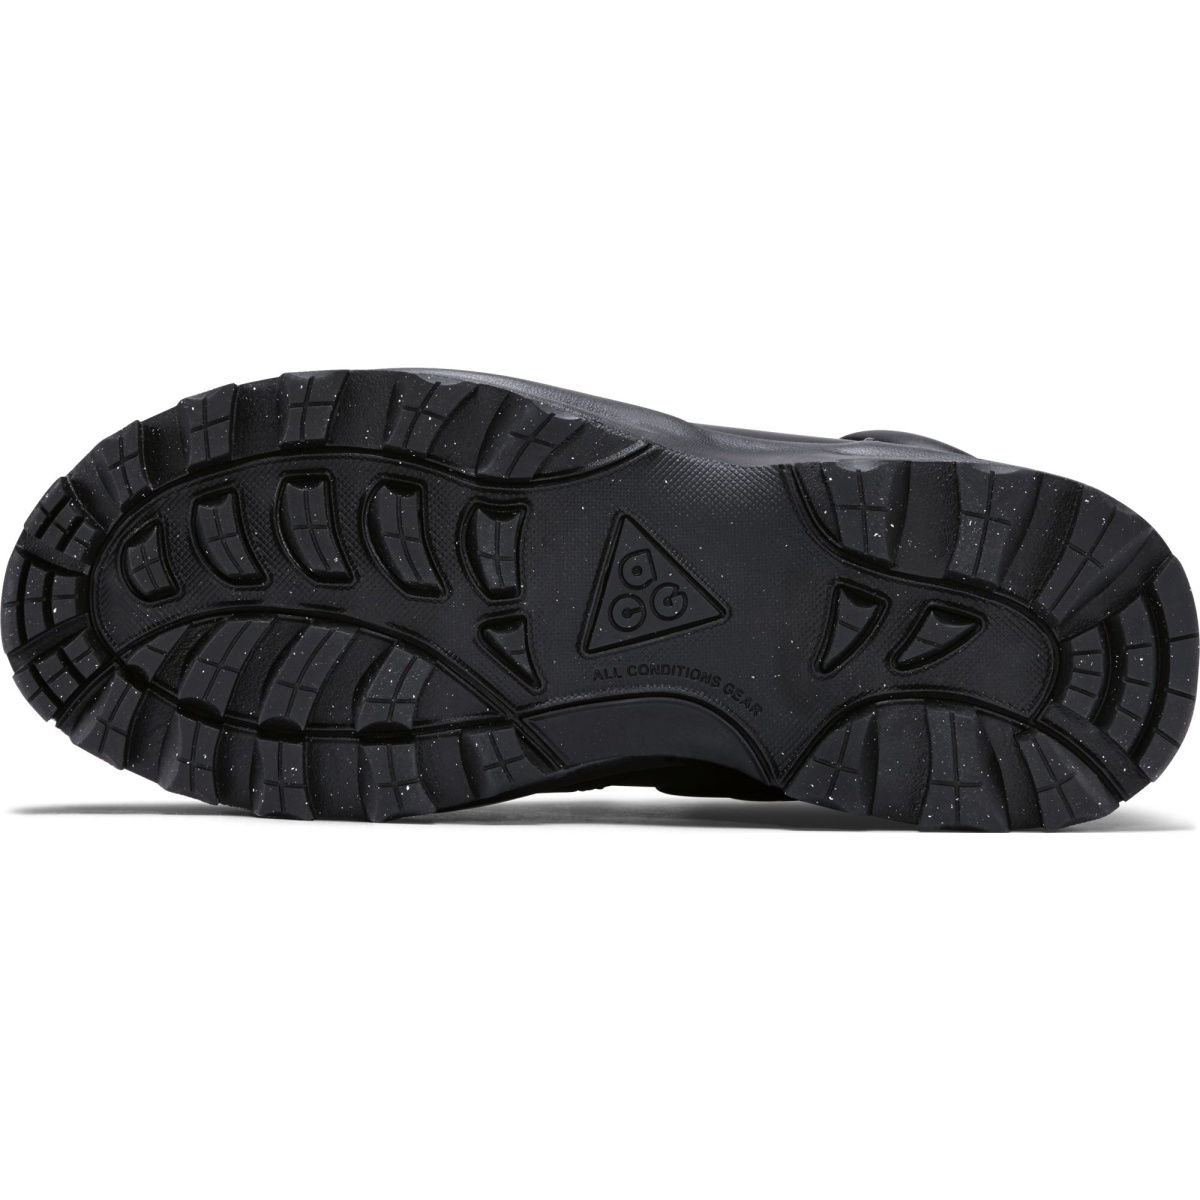 ... Nike Manoa Leather čierna 42 7012dbdefb9